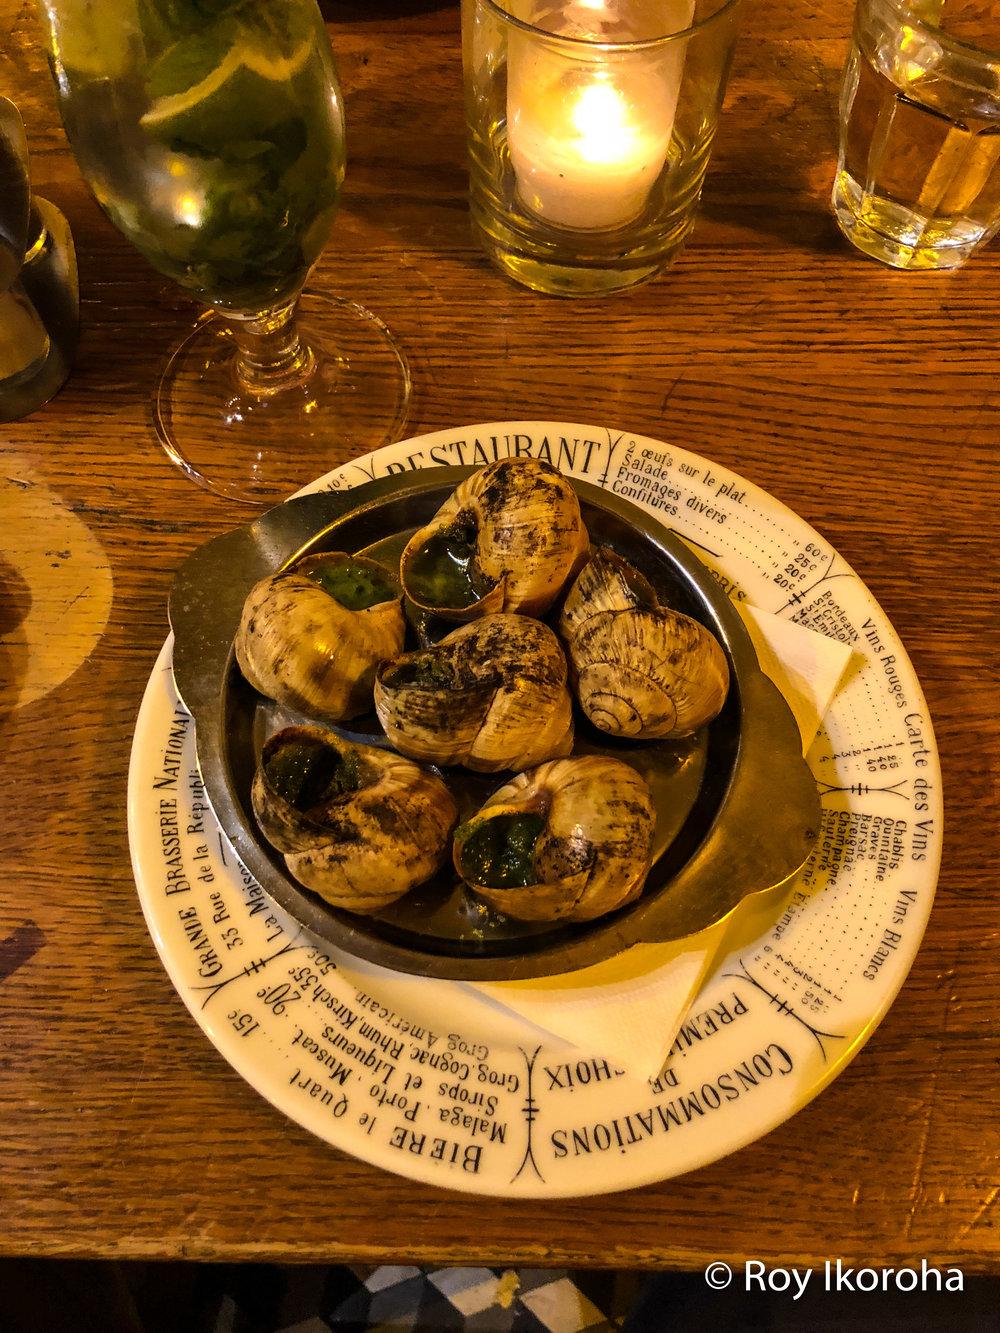 Trying snails, Odessa, Paris